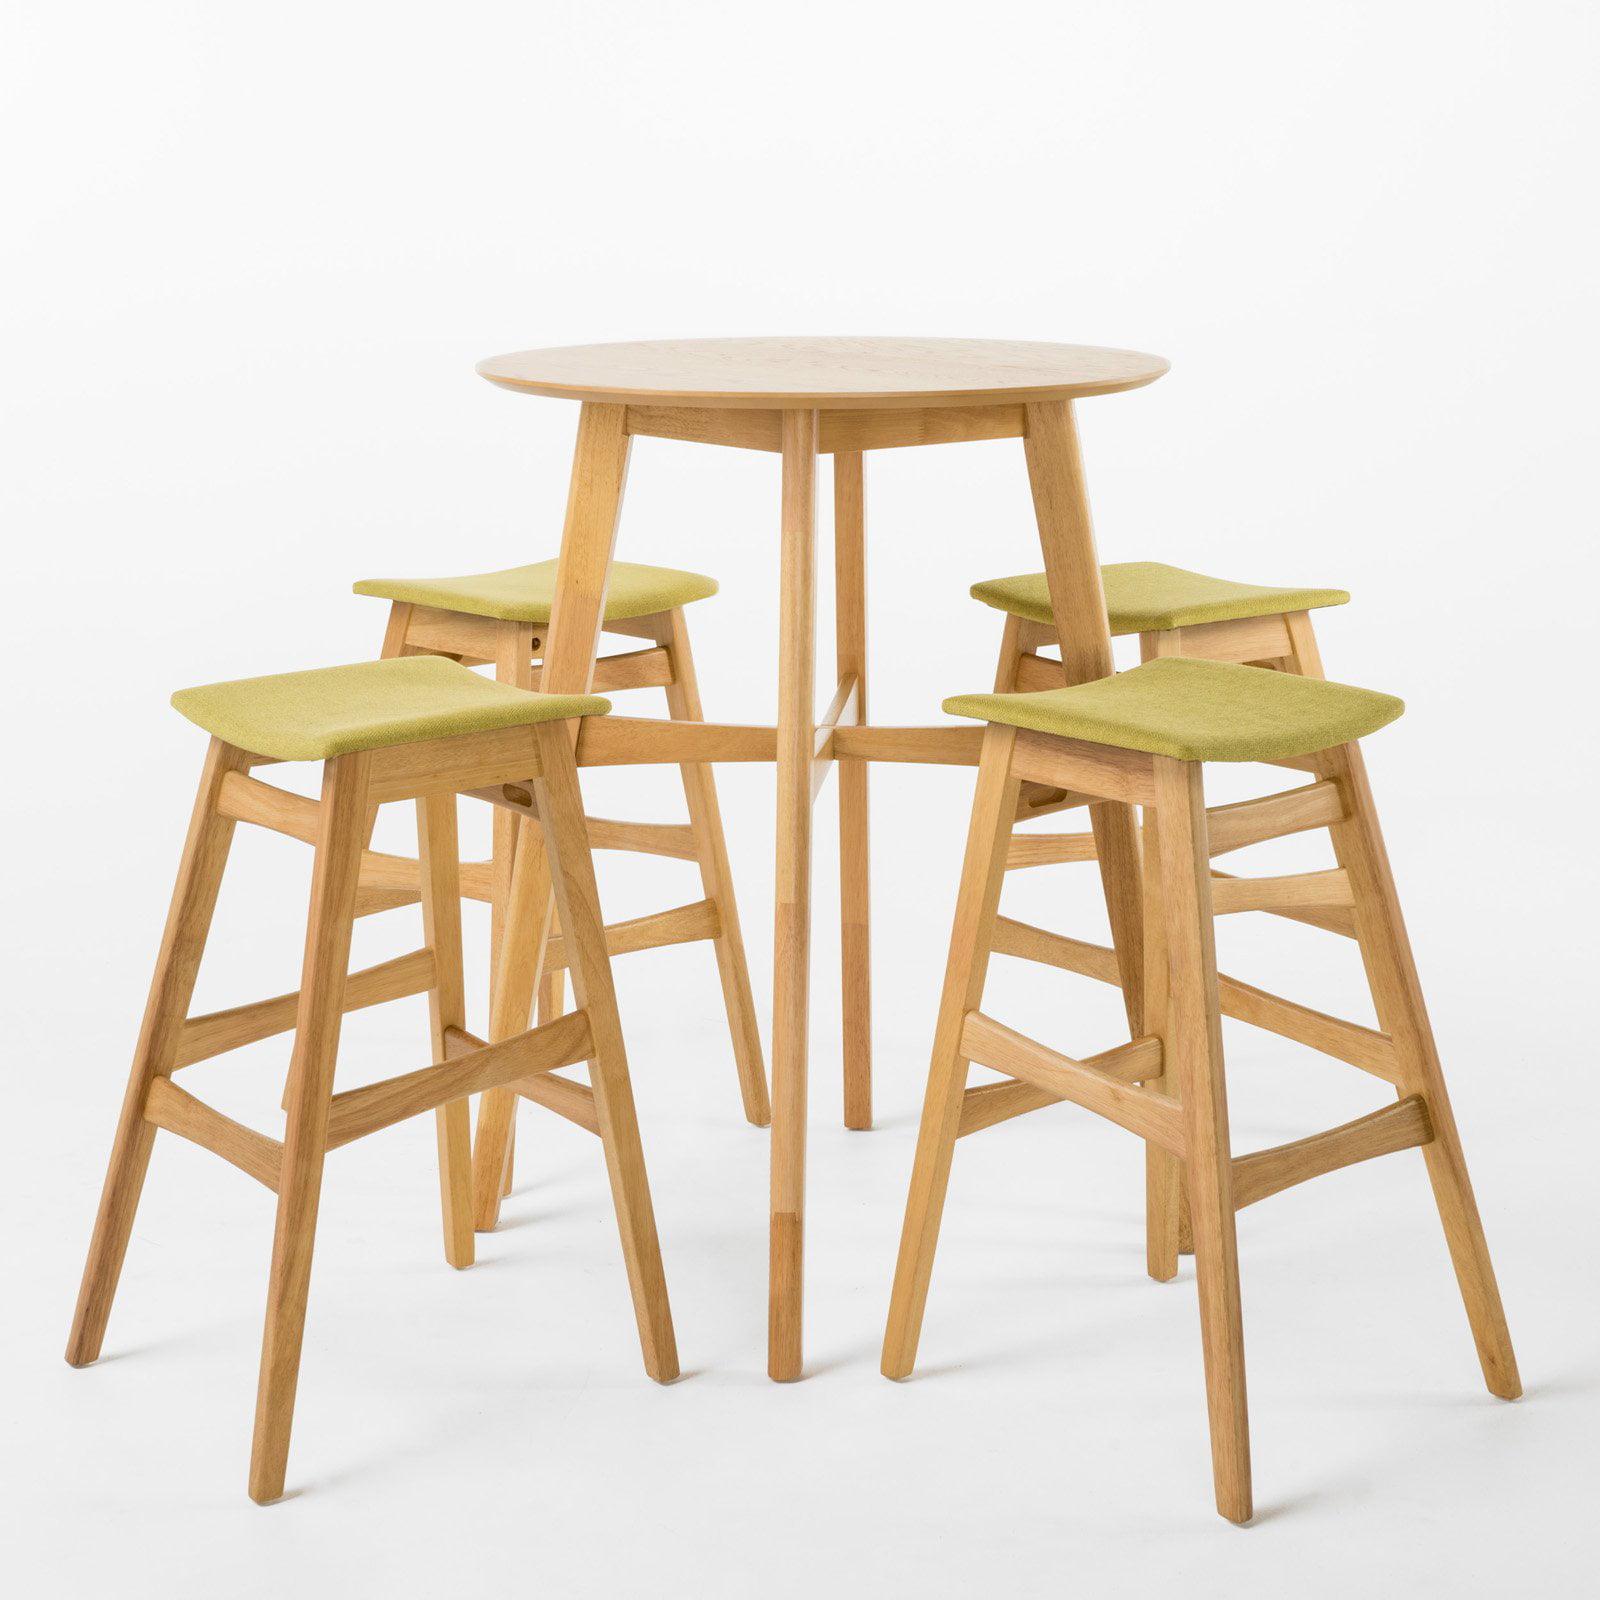 Evangeline Circular 5 Piece Wood Bar Height Dining Set